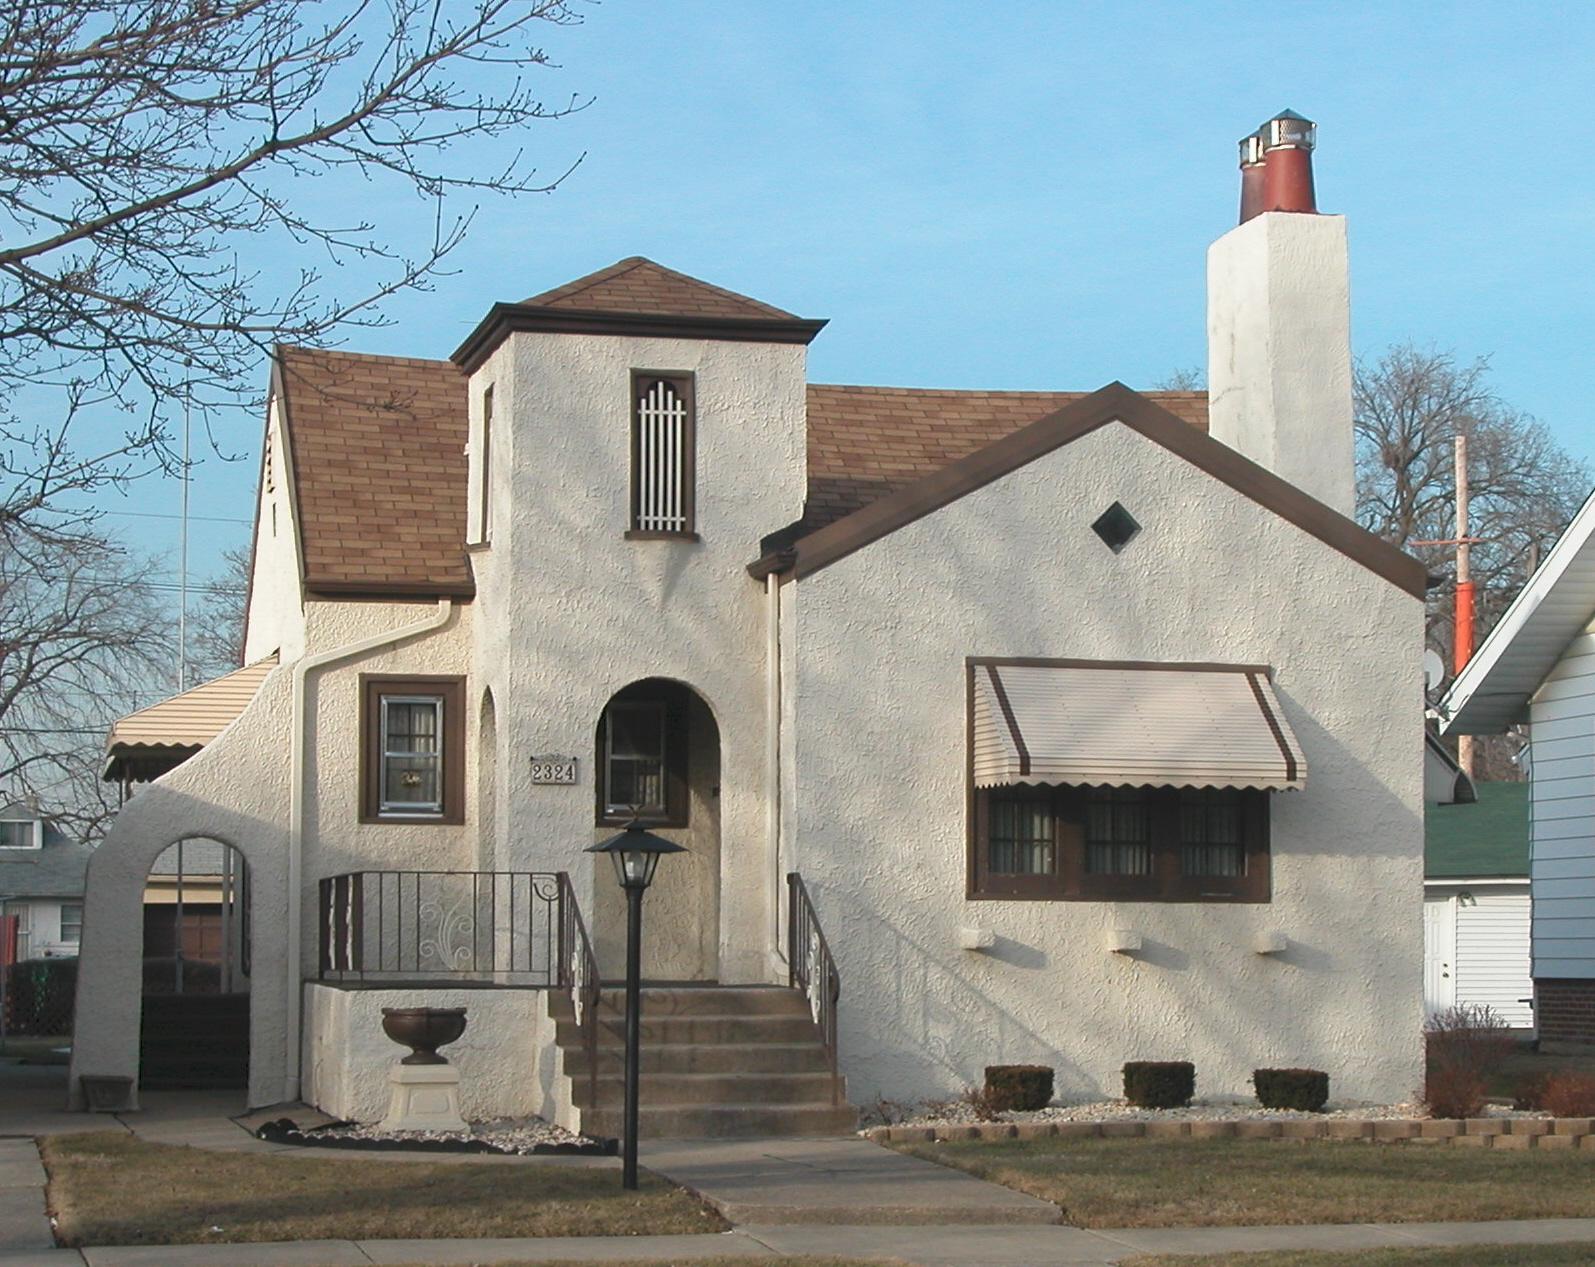 A Sears House With Southwestern Flair